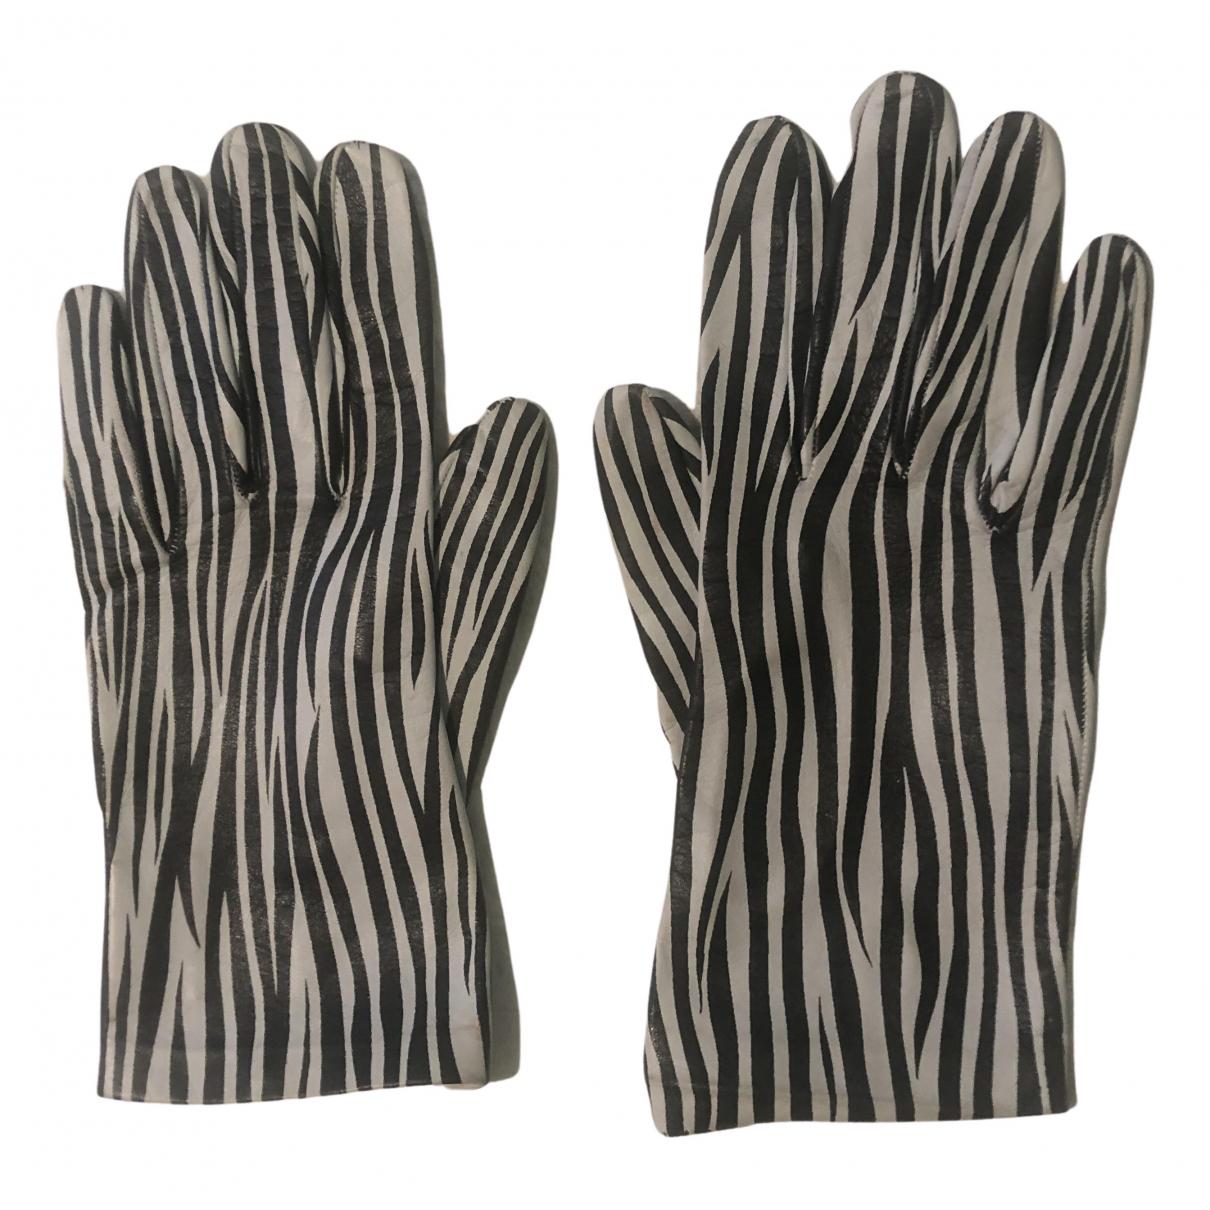 Gianfranco Ferré N Multicolour Leather Gloves for Women L International